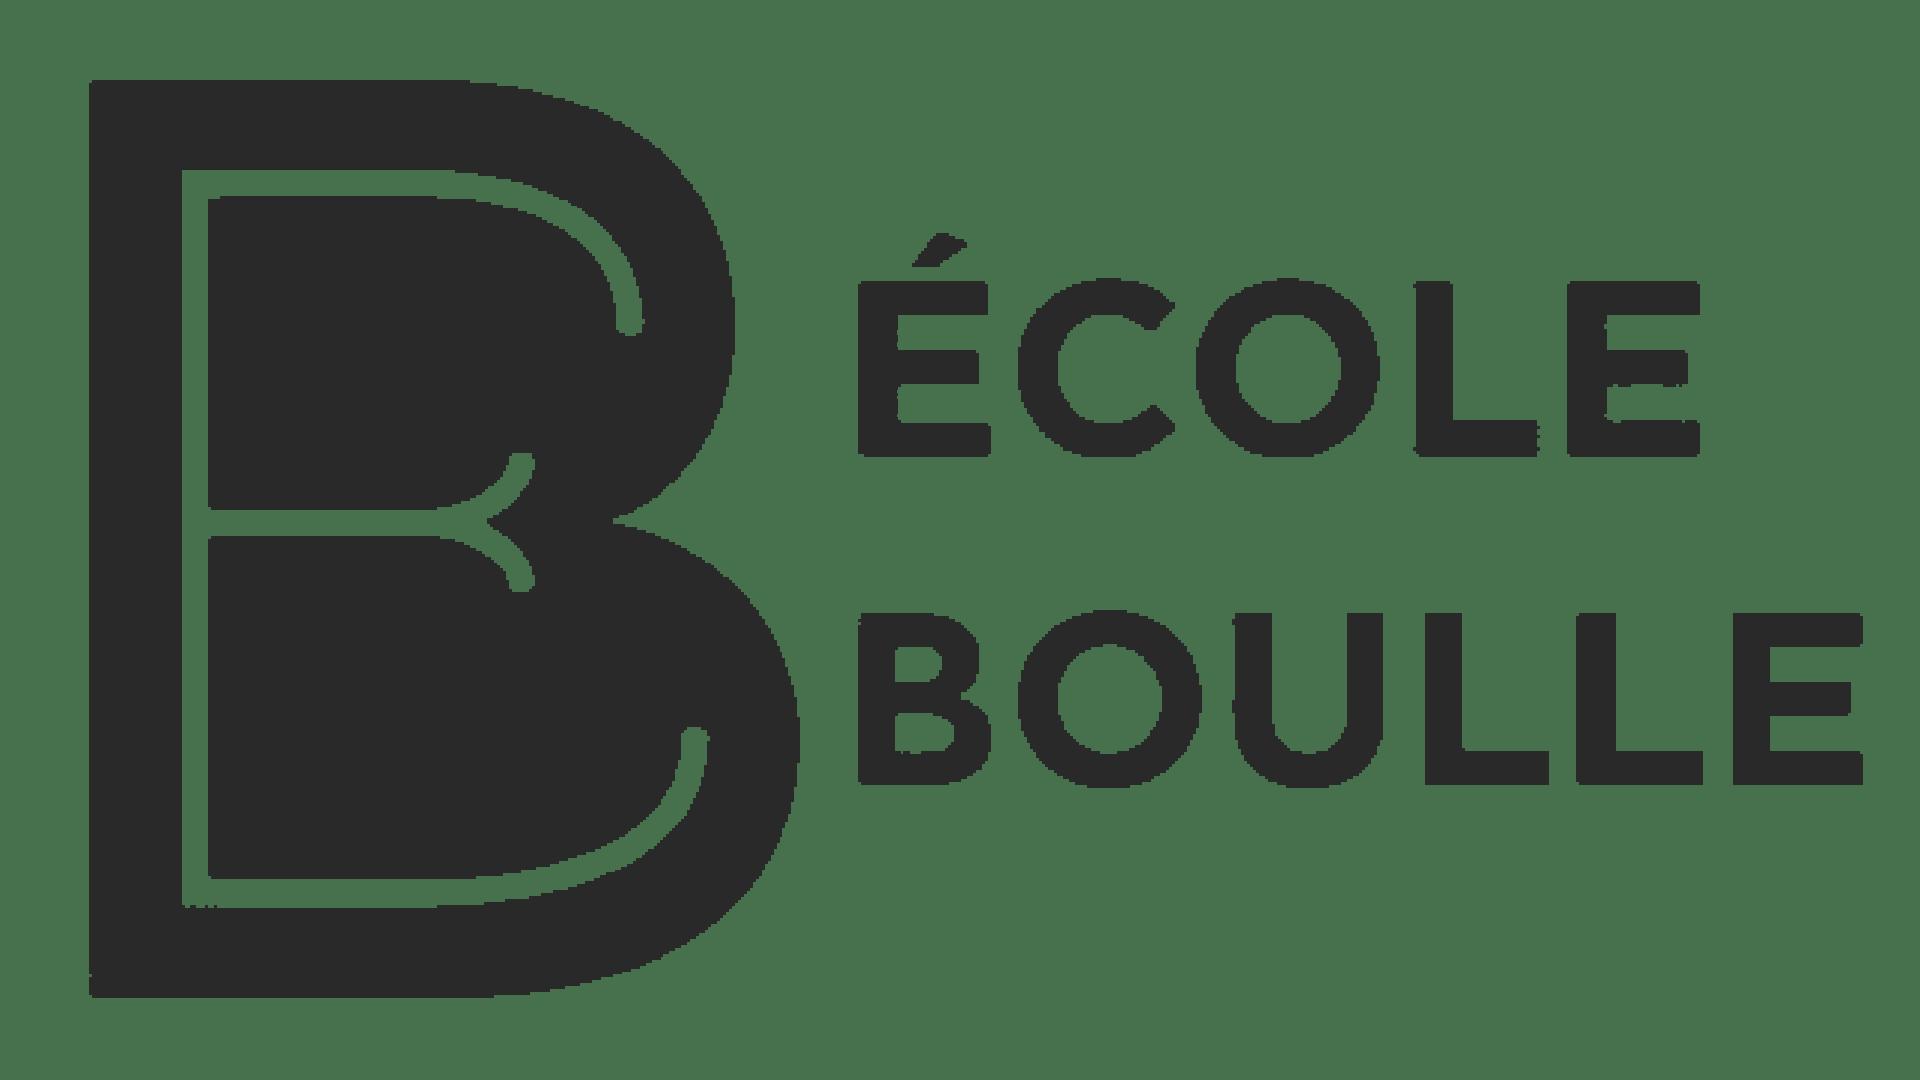 Ecole Boulle